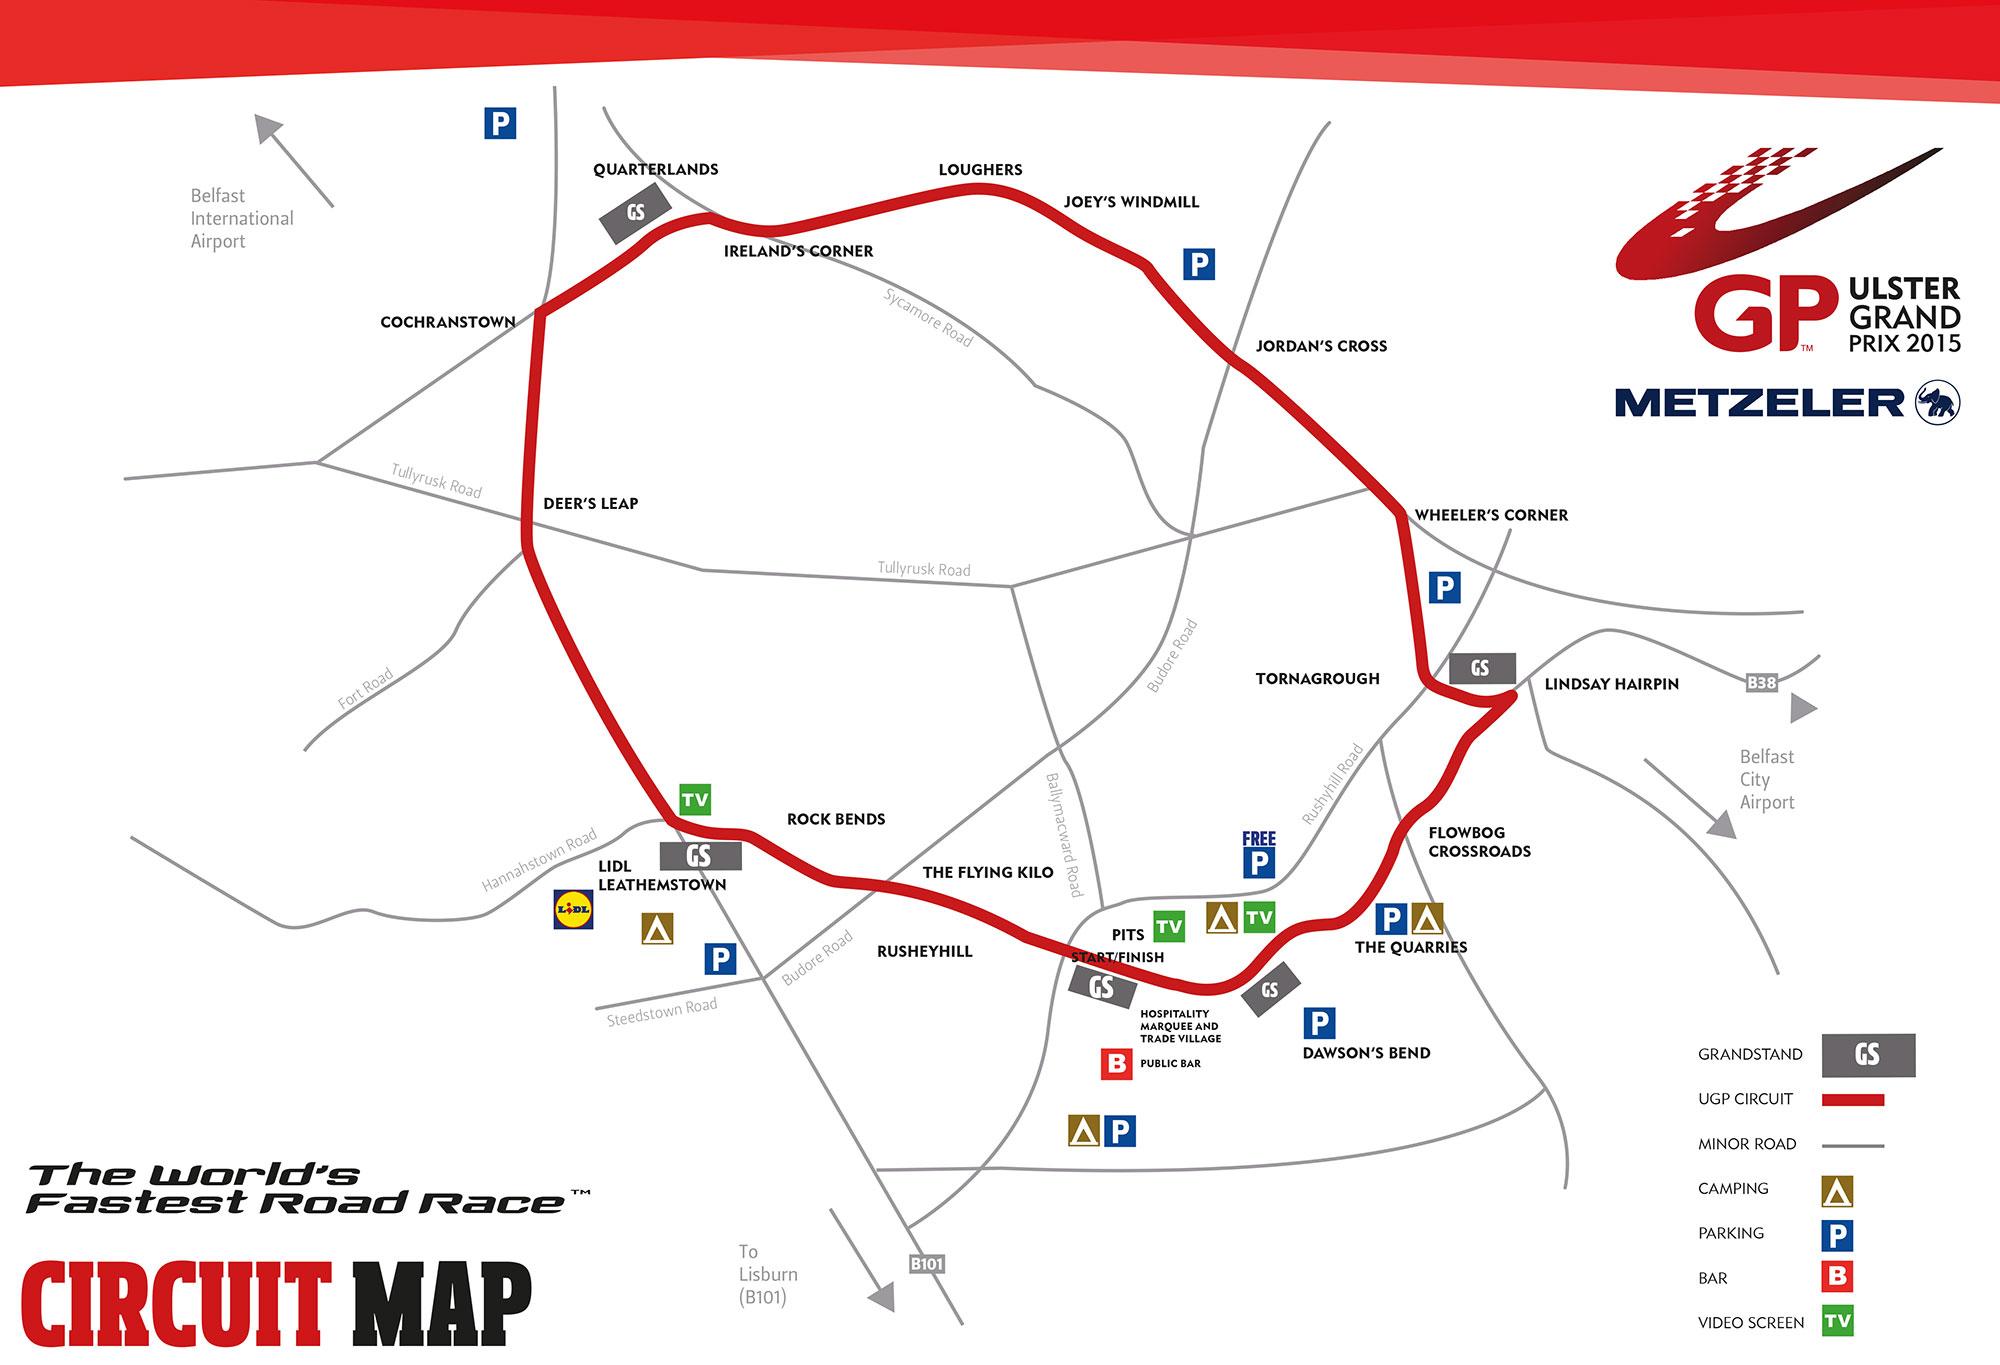 [Road Racing] Ulster GP 2015 Cicruitmap2015